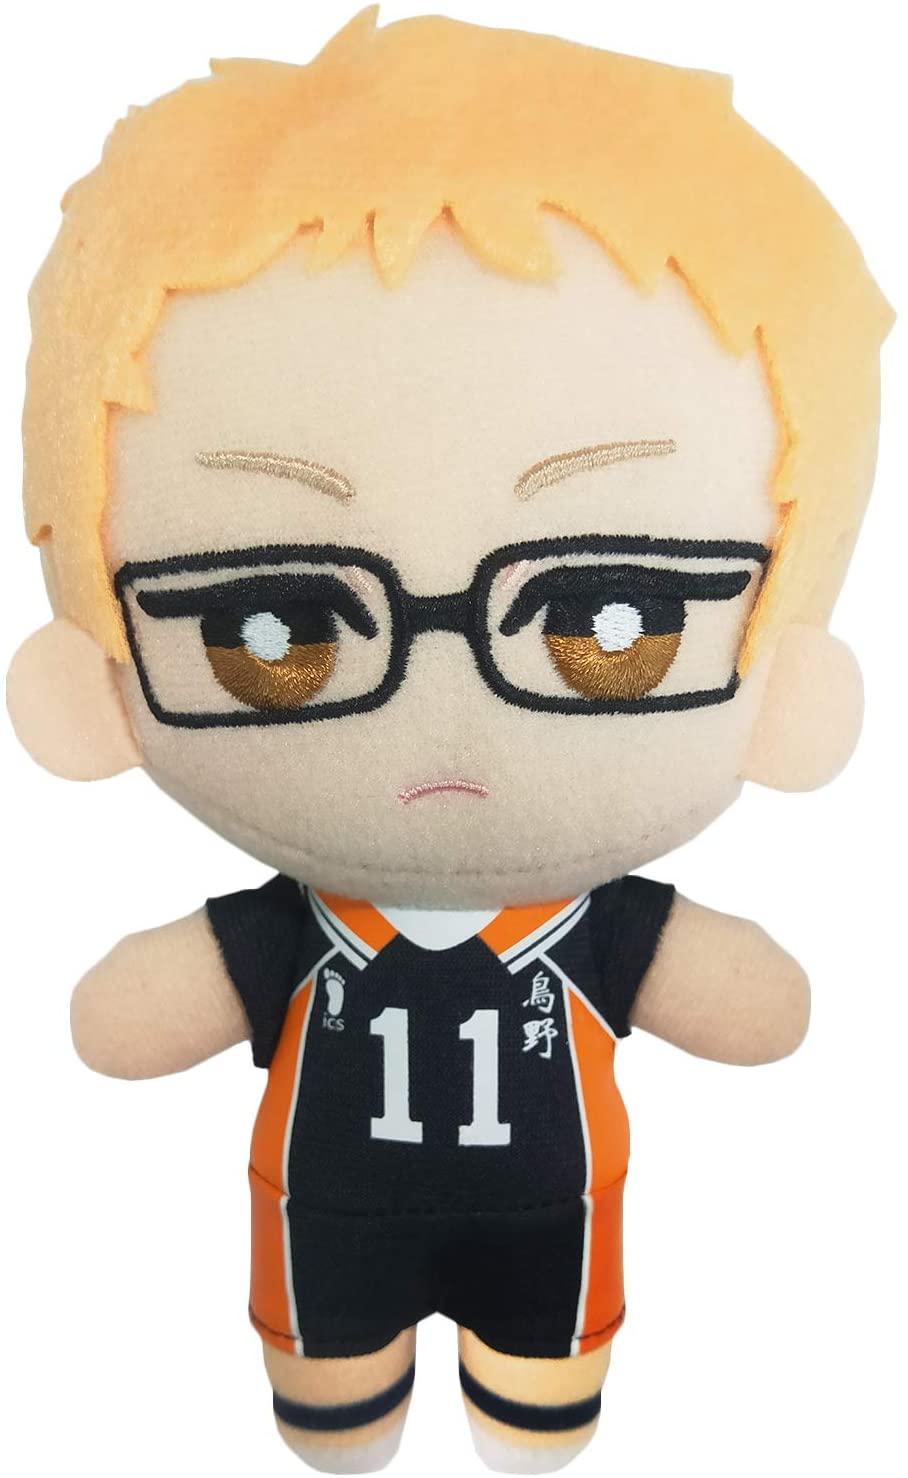 Yulefly Tsukishima Plush Toy Plushies Dolls Cute Stuffed Toys Great Gift for Anime Fans